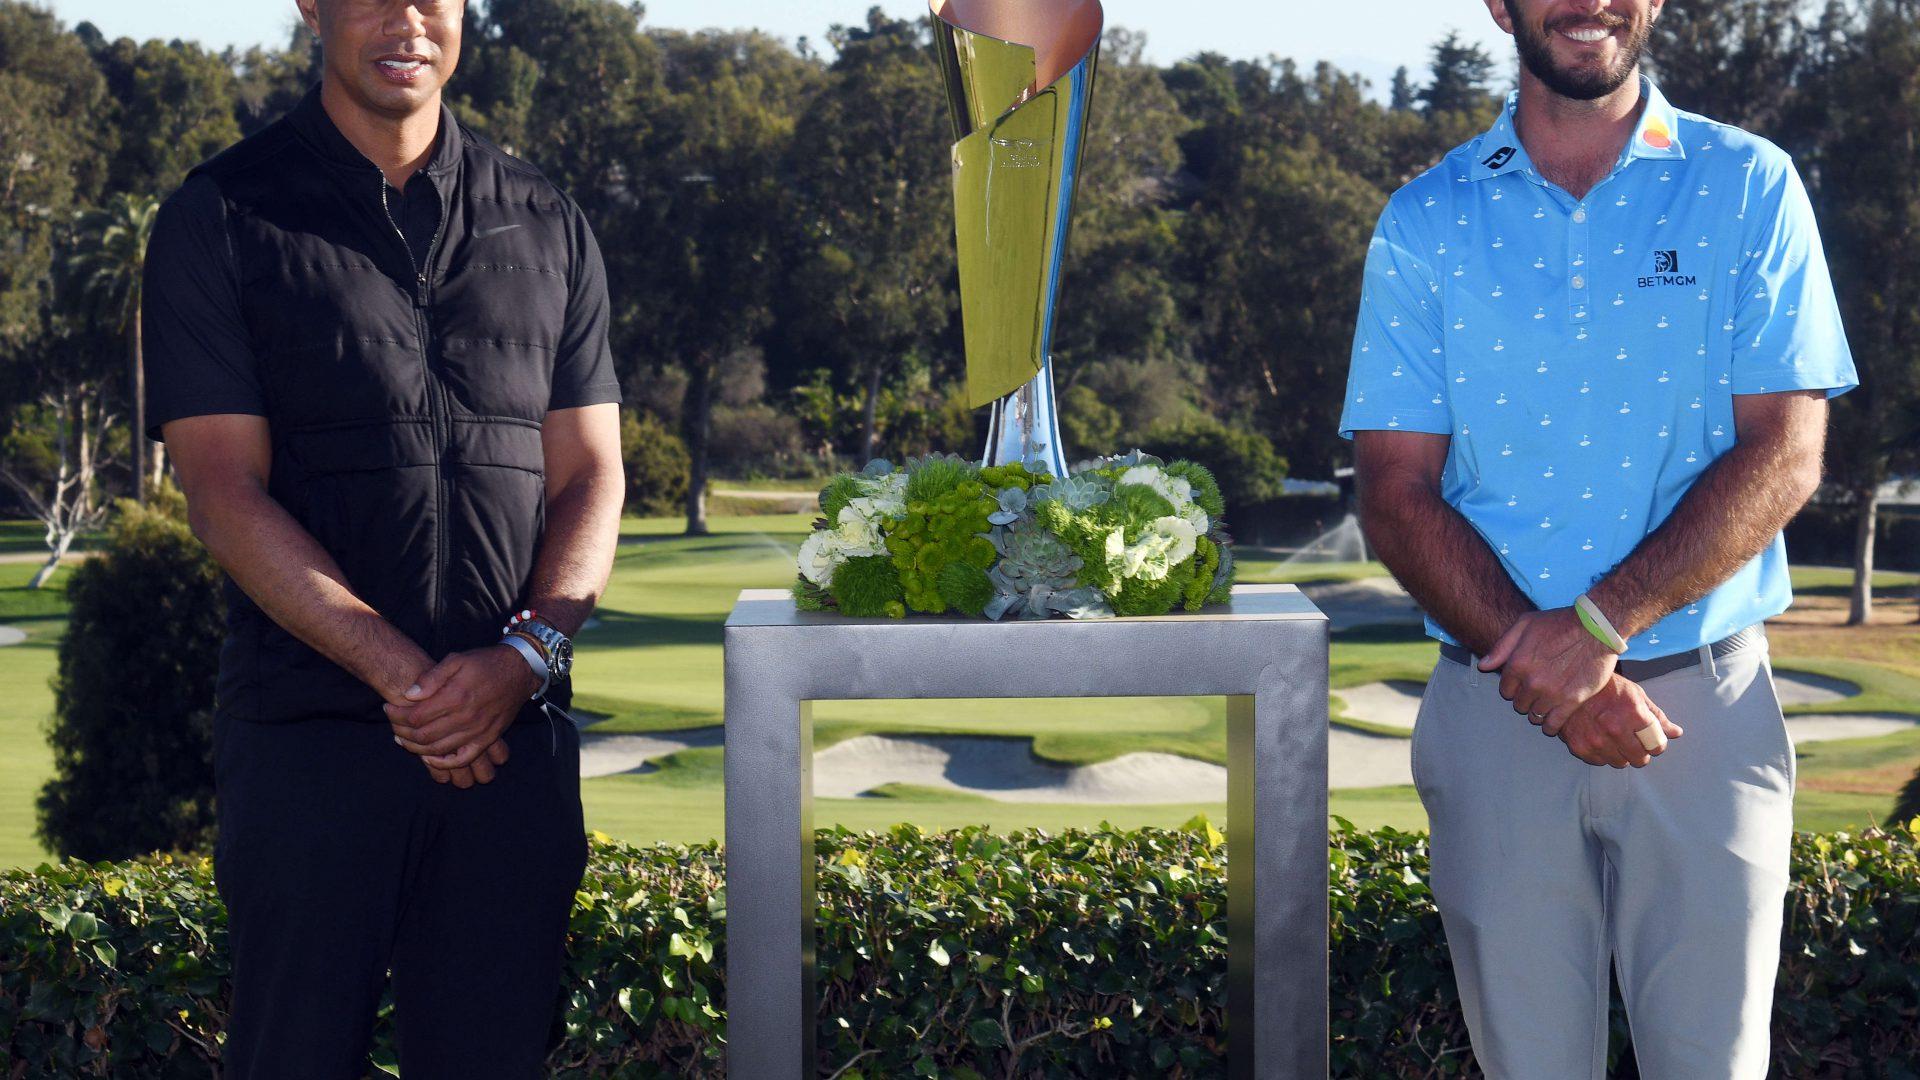 Genesis Invitational 2021, Sieger Max Homa mit Tiger Woods, Riviera Country Club, Los Angeles, PGA Tour